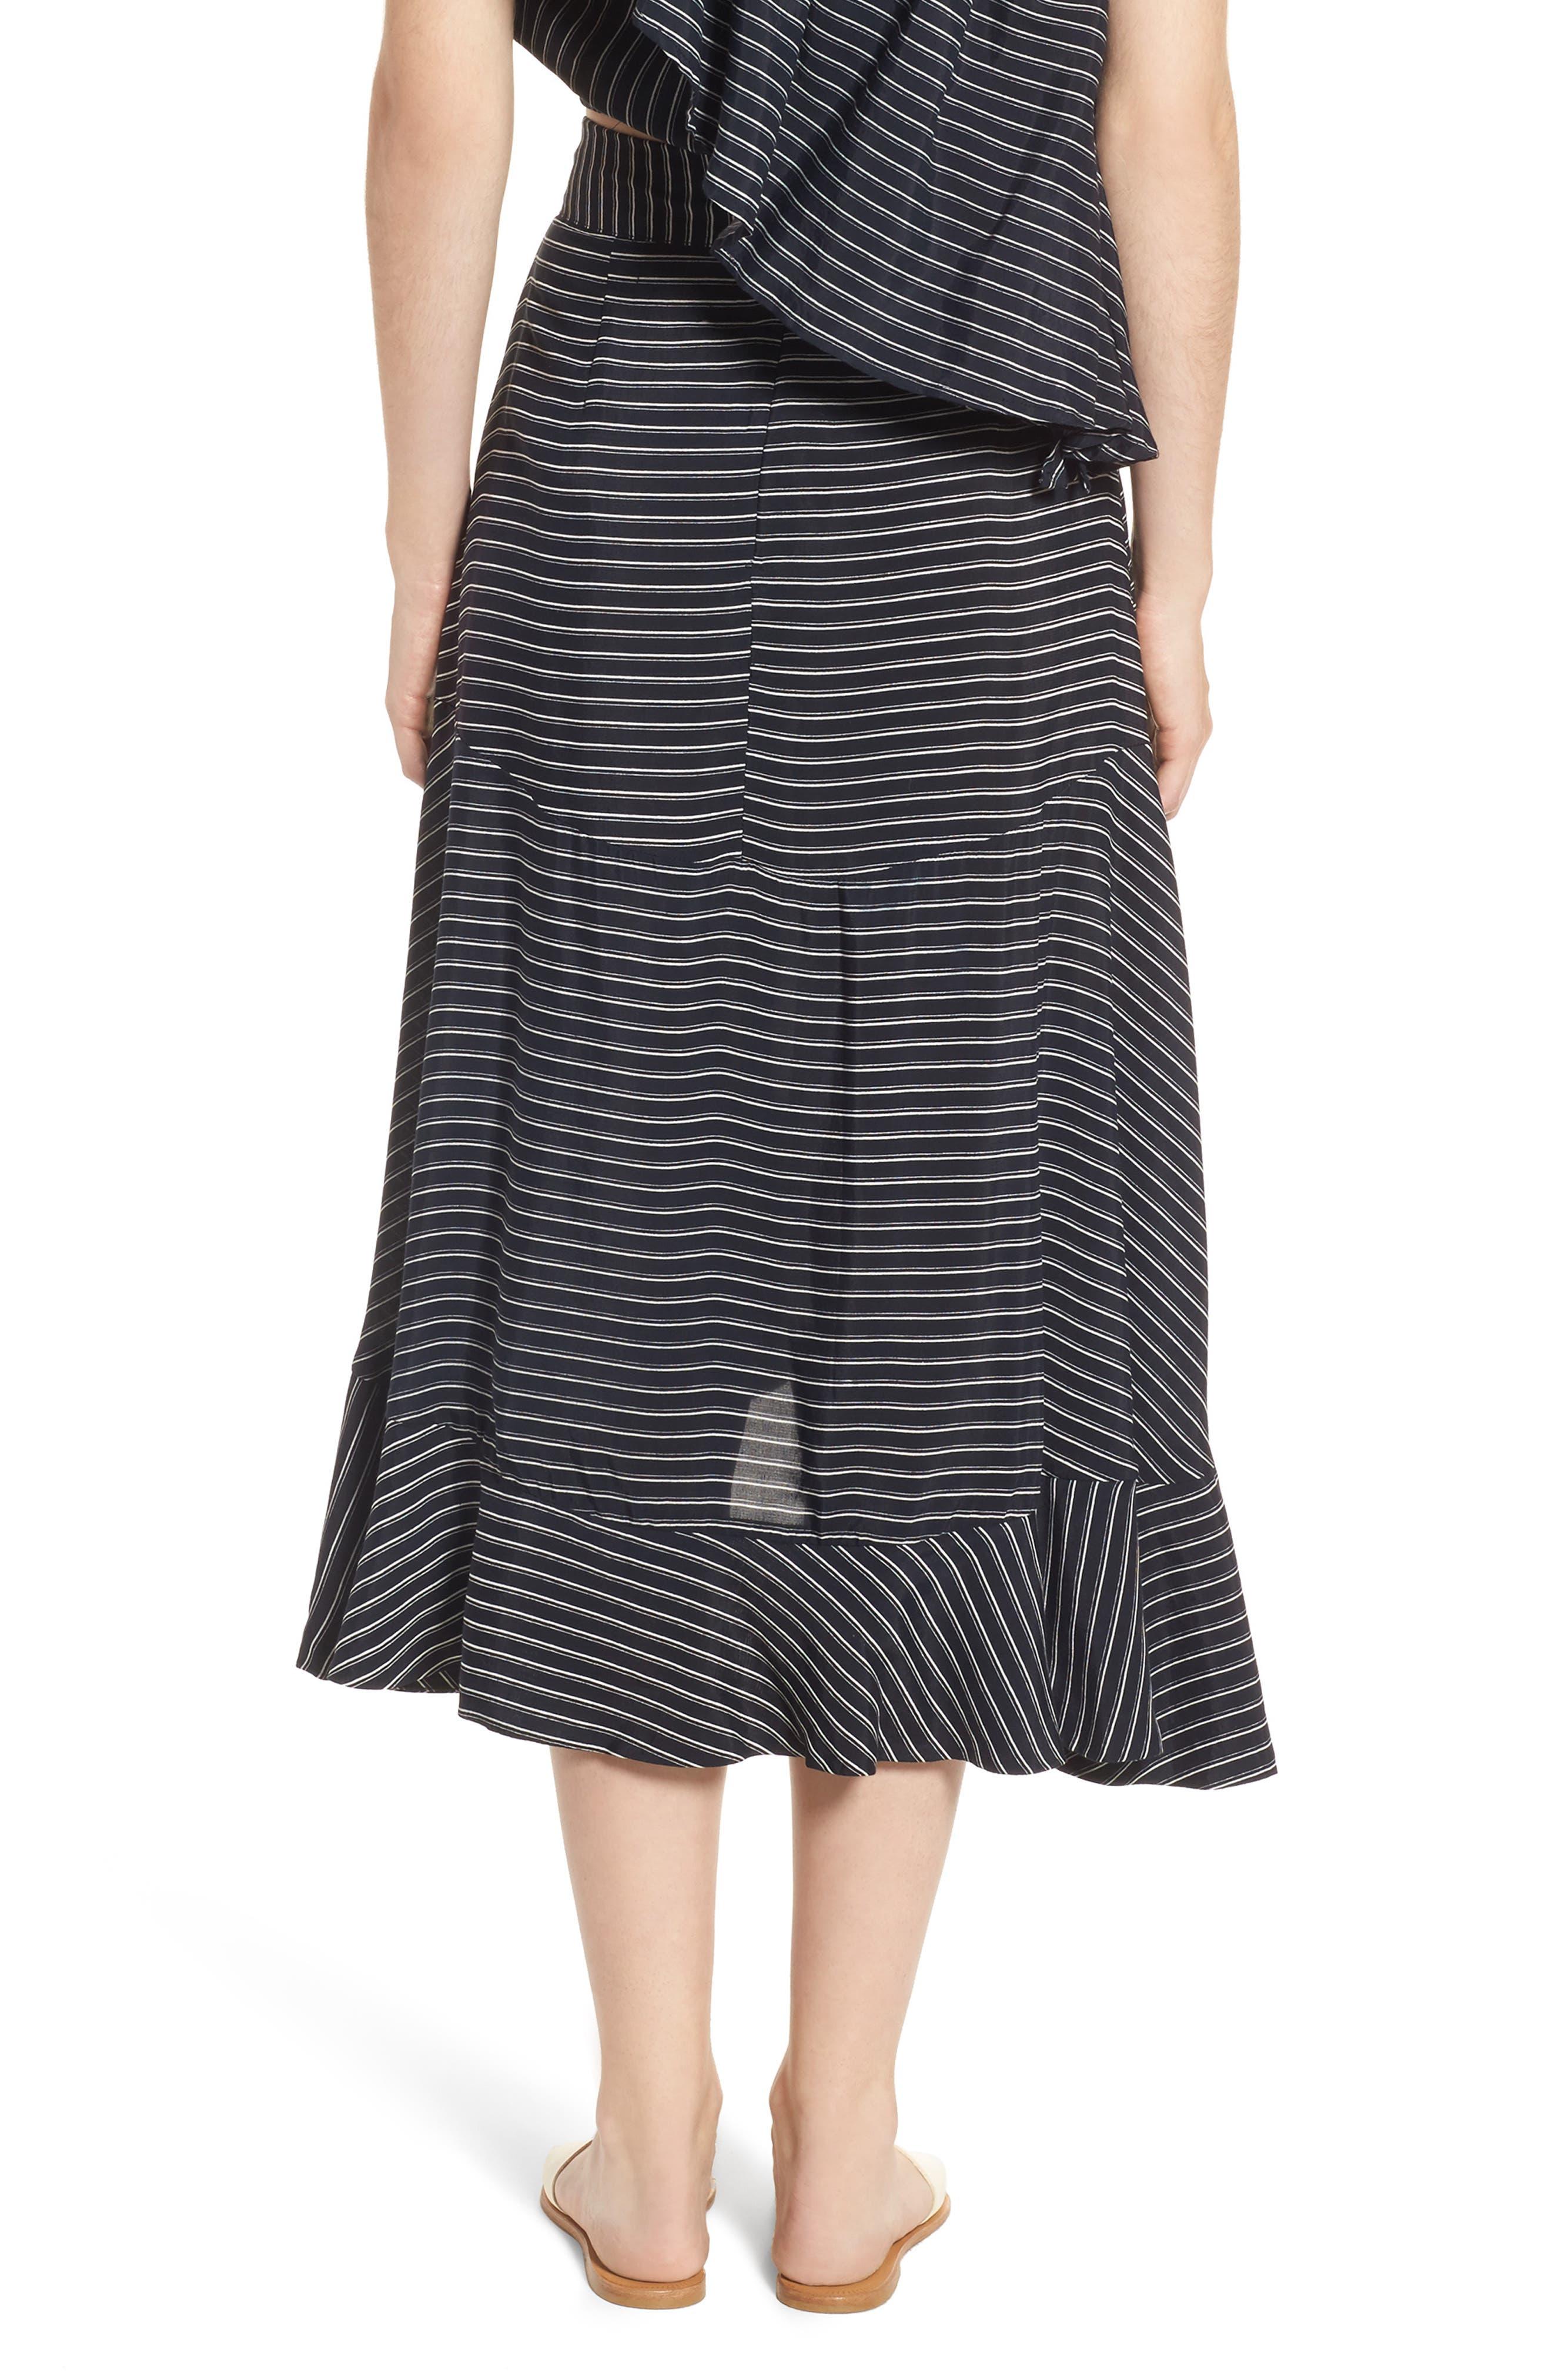 Kamares Ruffle Midi Skirt,                             Alternate thumbnail 2, color,                             001